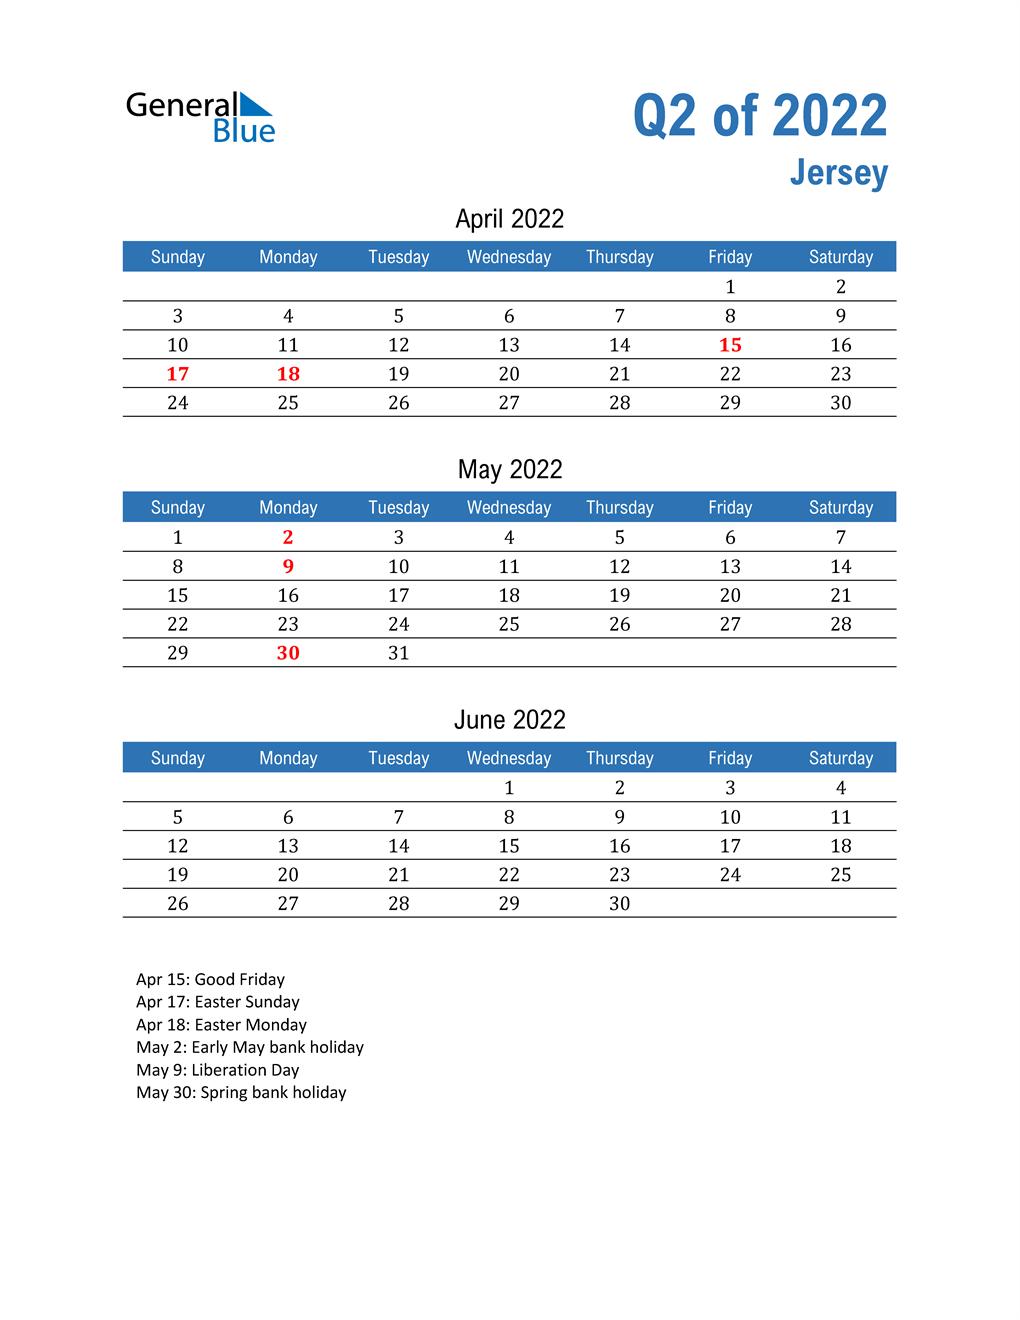 Jersey 2022 Quarterly Calendar